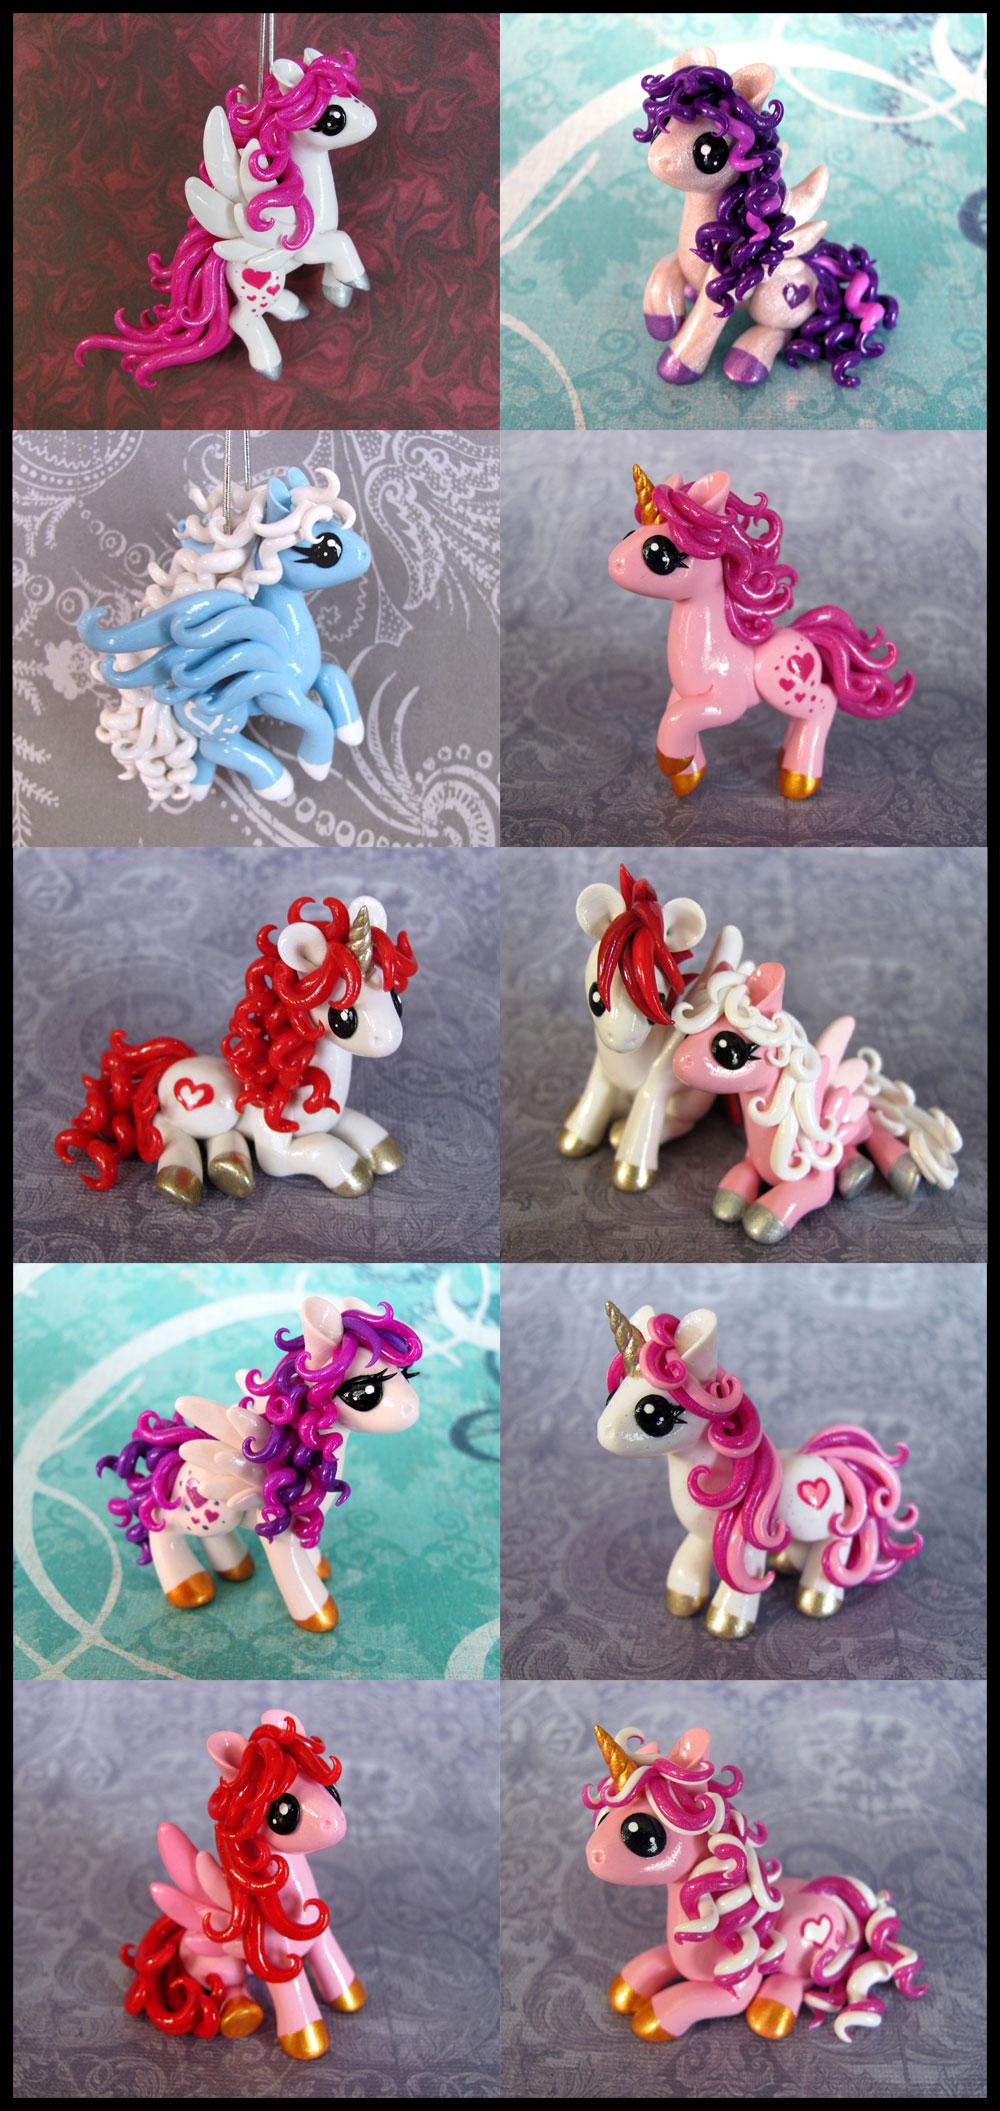 Valentine Ponies 2014 by DragonsAndBeasties